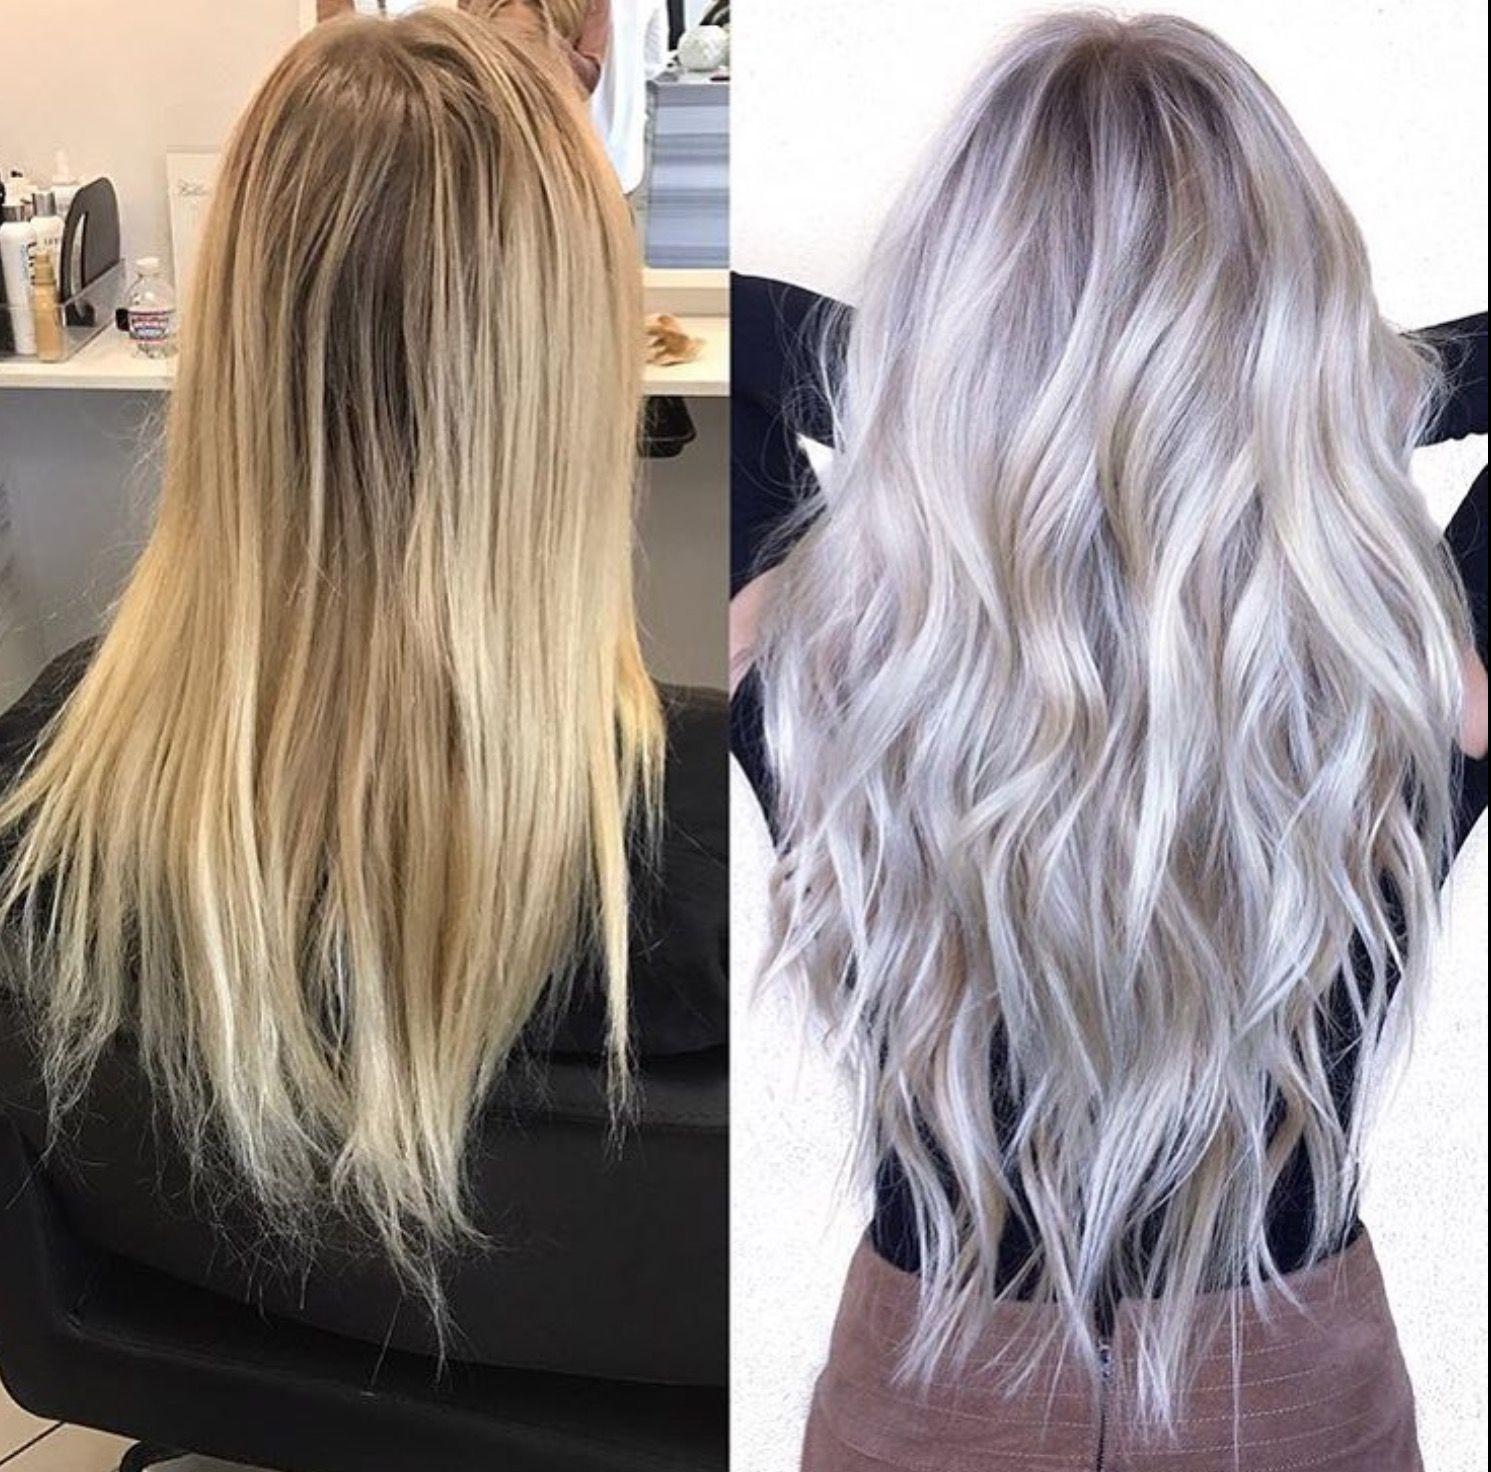 The 55 Best Ash Blonde Hair Colors On Instagram Blonde